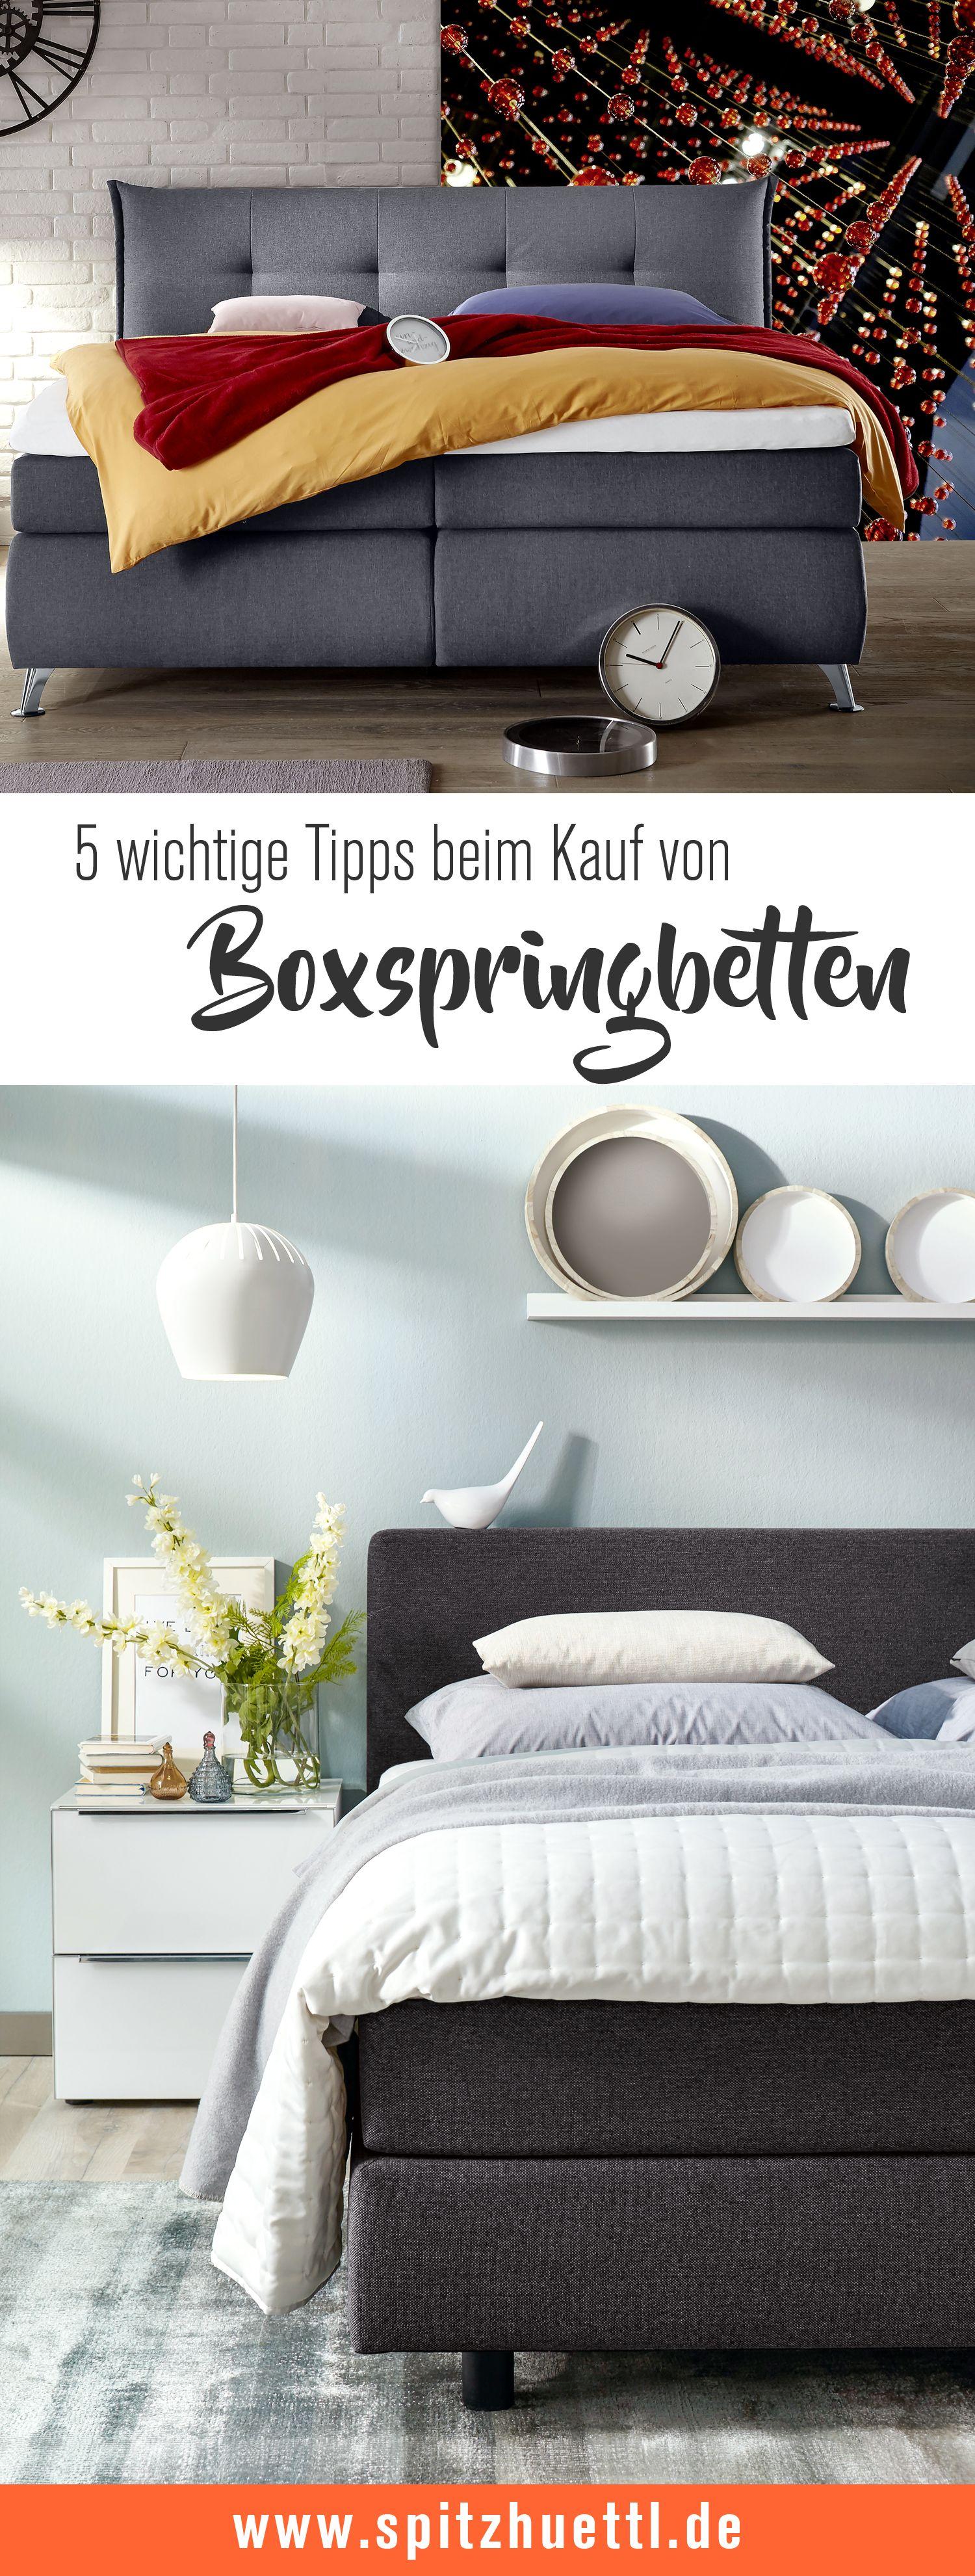 Boxspringbetten Tipps Zum Kauf Boxspringbett Bett Und